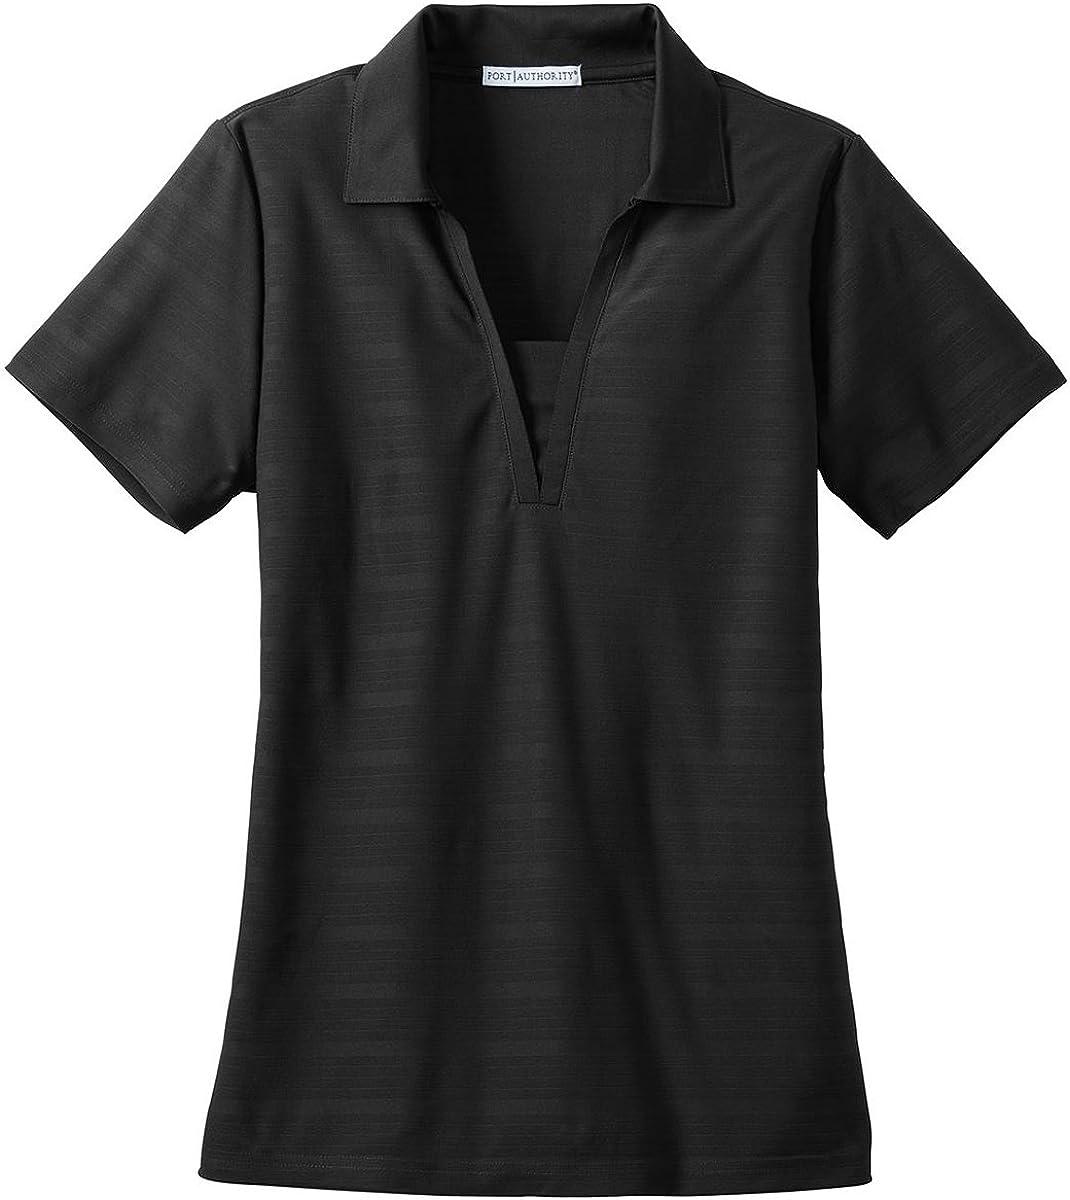 Port Authority Ladies Horizontal Texture Polo - Black L514 L